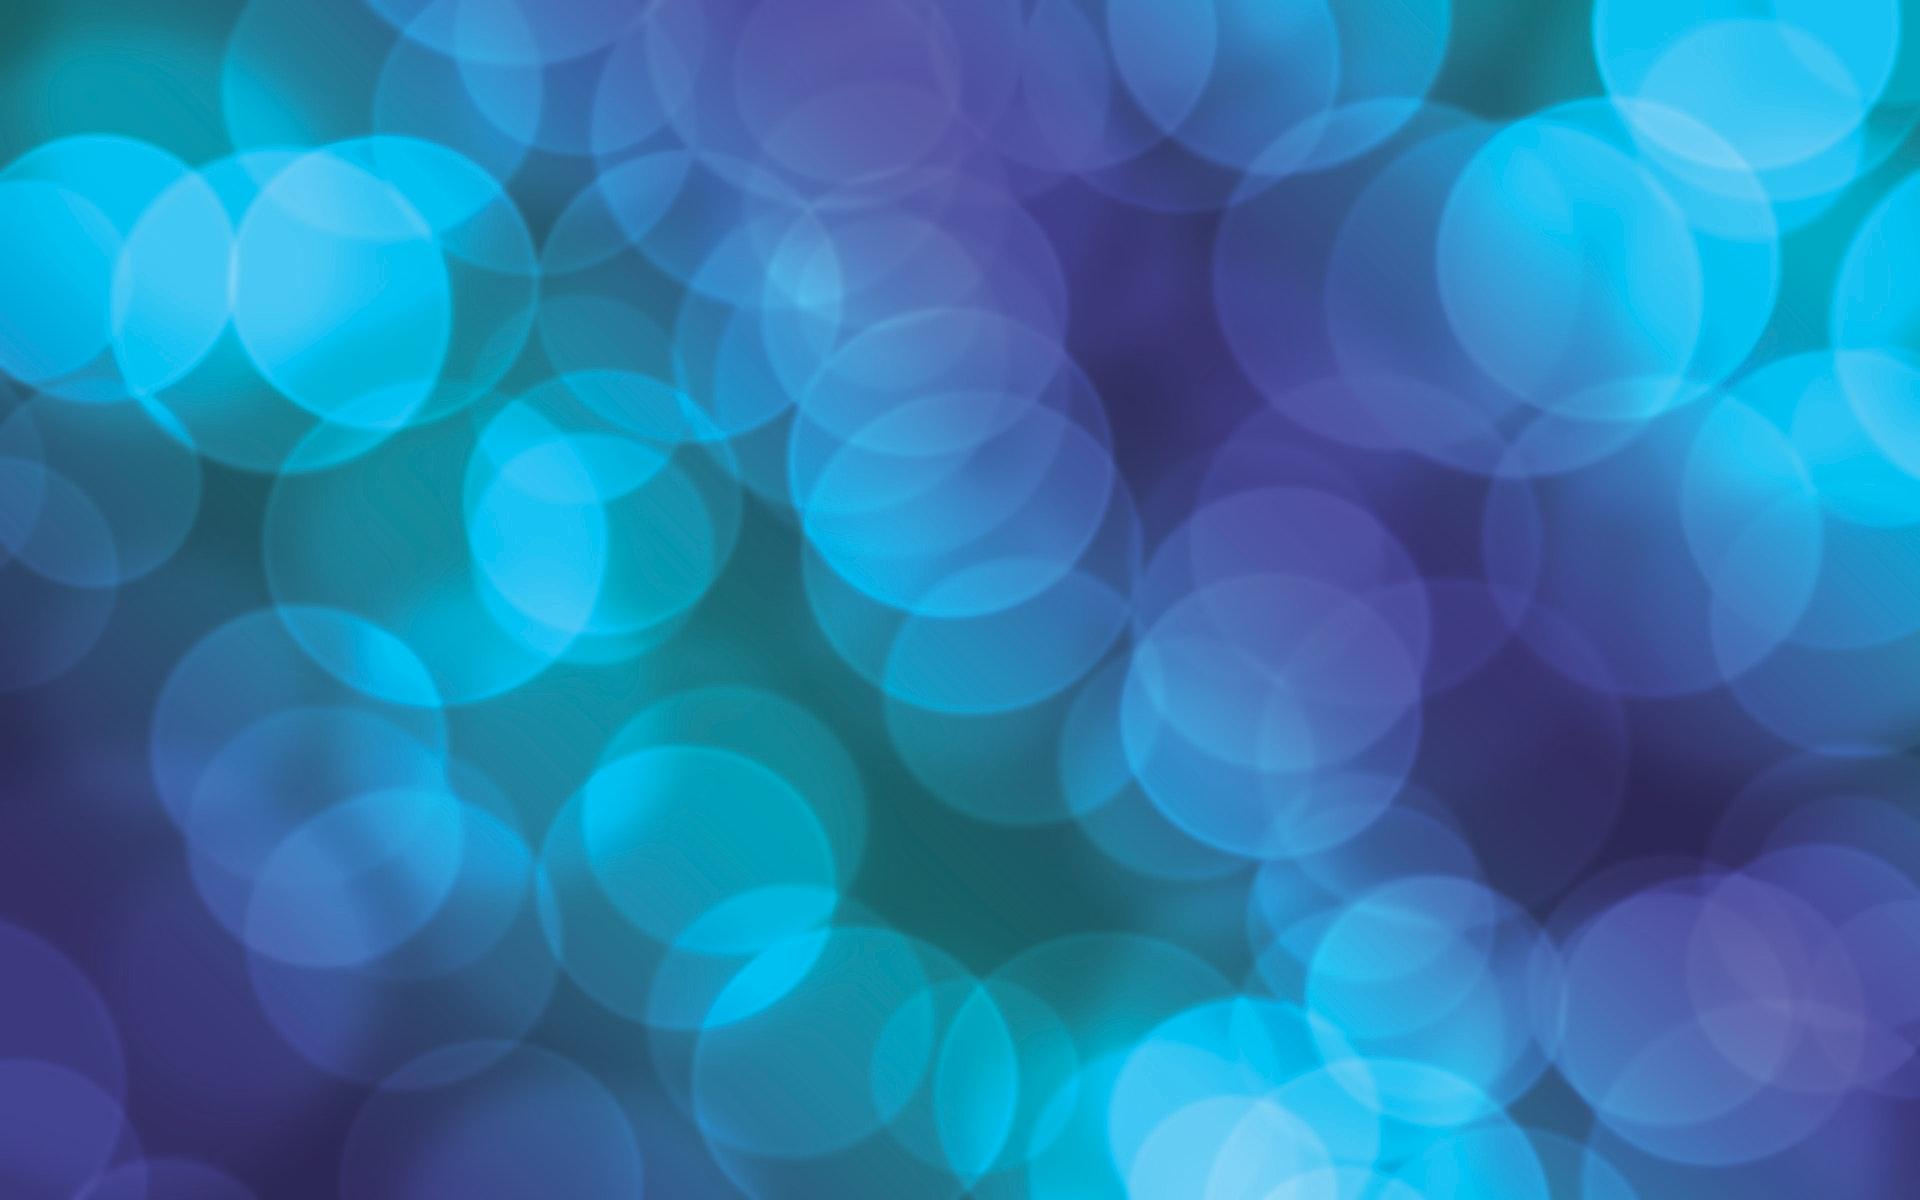 Download 88 Koleksi Background Blue Wallpaper Hd Gratis Terbaru